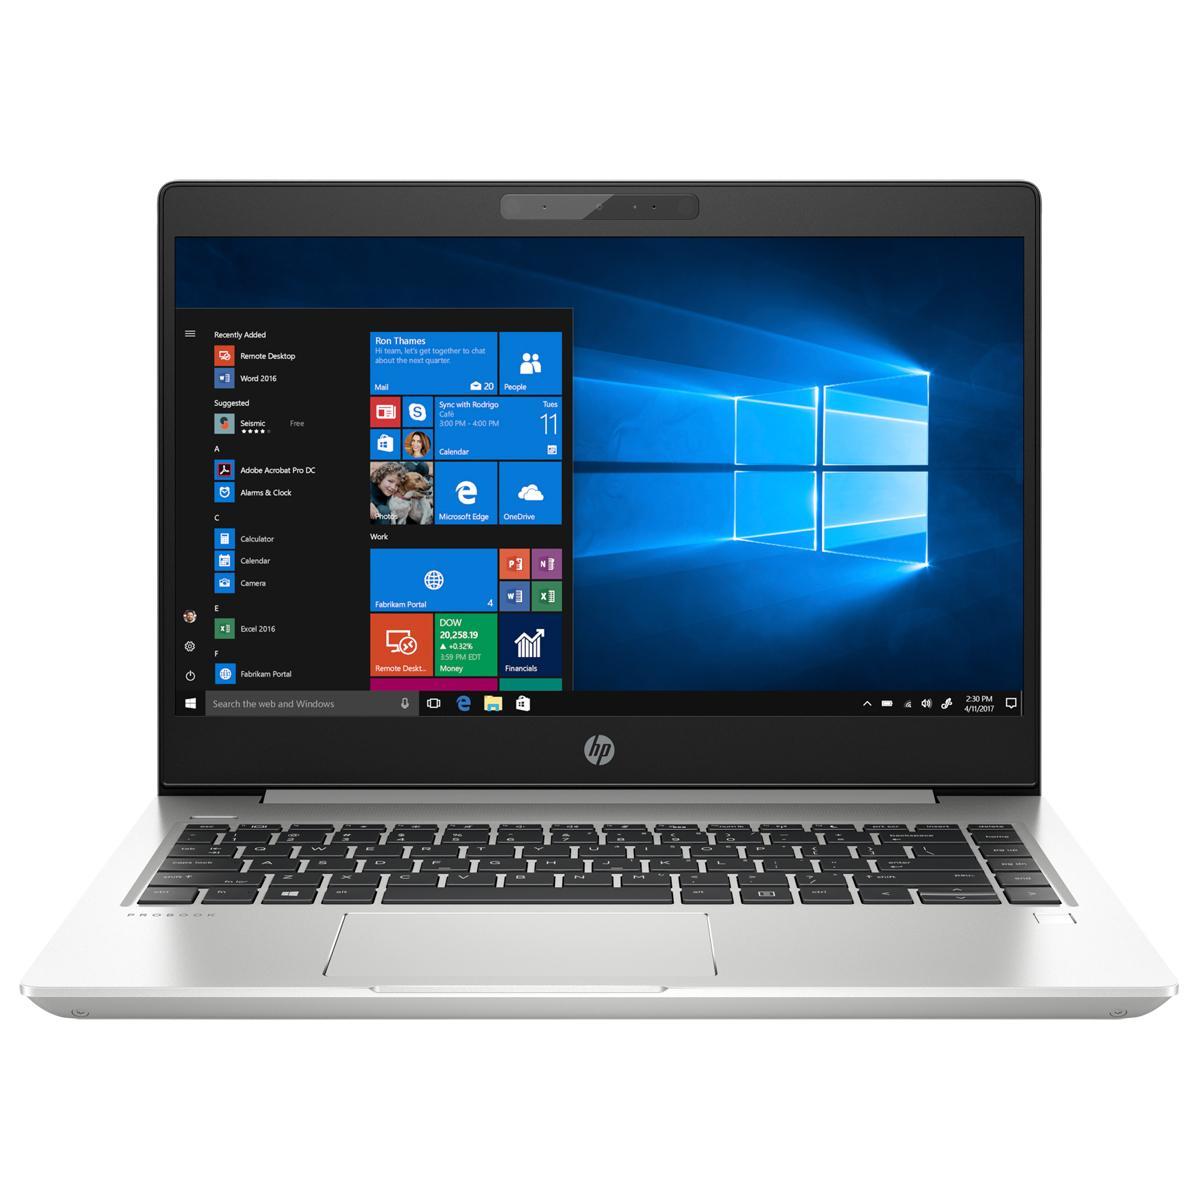 "Nešiojamas kompiuteris HP ProBook 440 G6 6HM68ES 14"" FHD IPS, Intel i7-8565U, 8GB RAM, 512GB SSD, Windows 10 Pro Žema kaina | Varle.lt"